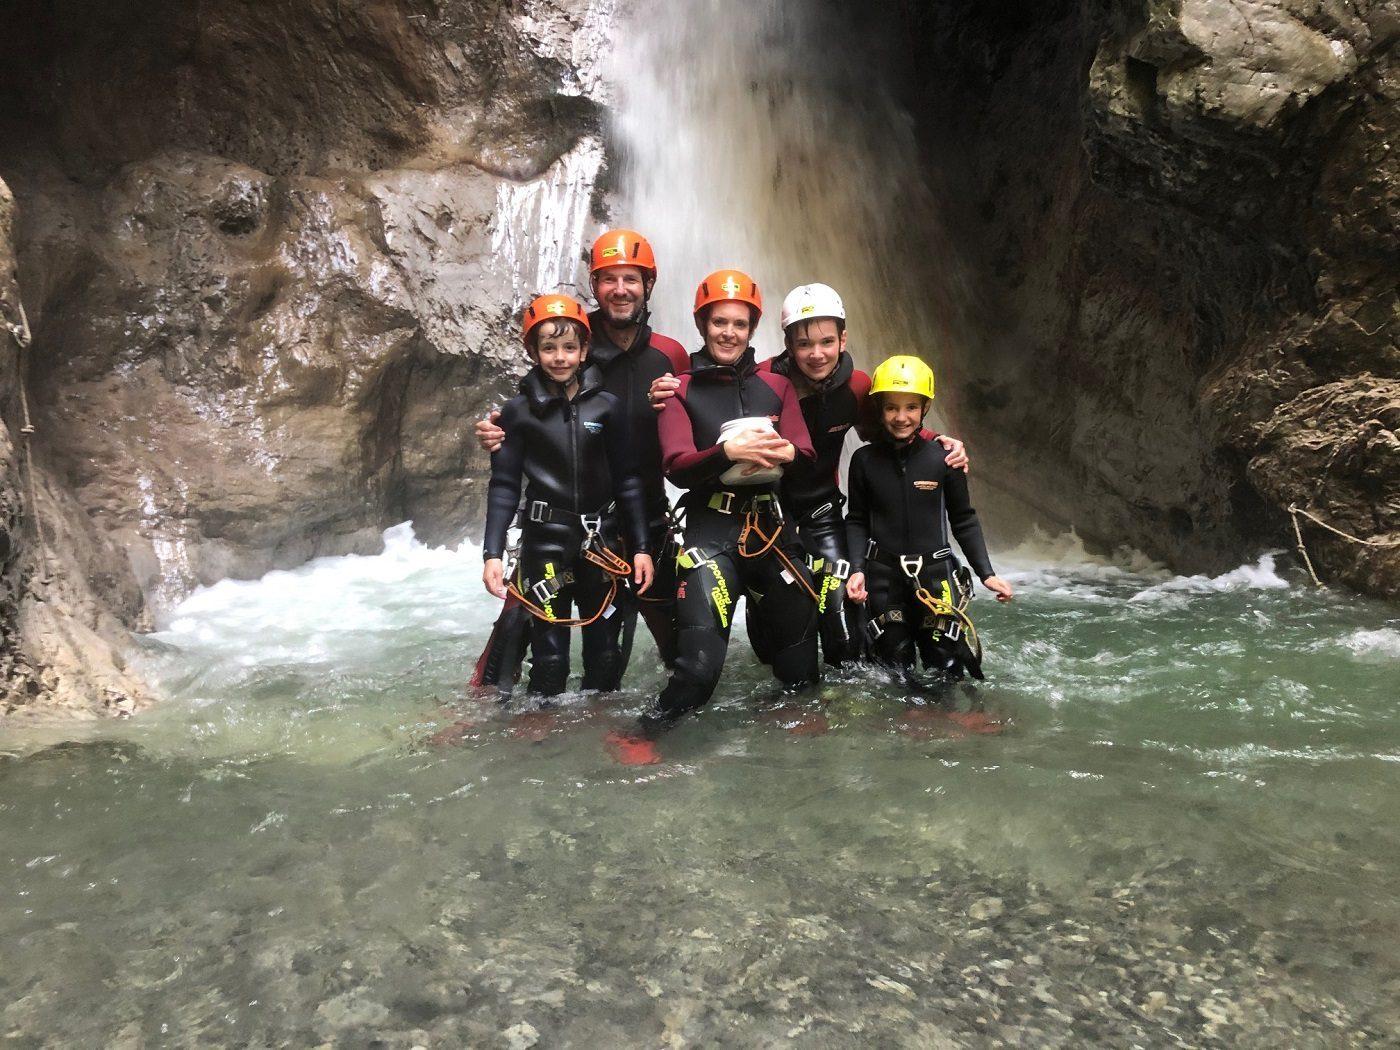 canyoning familienurlaub